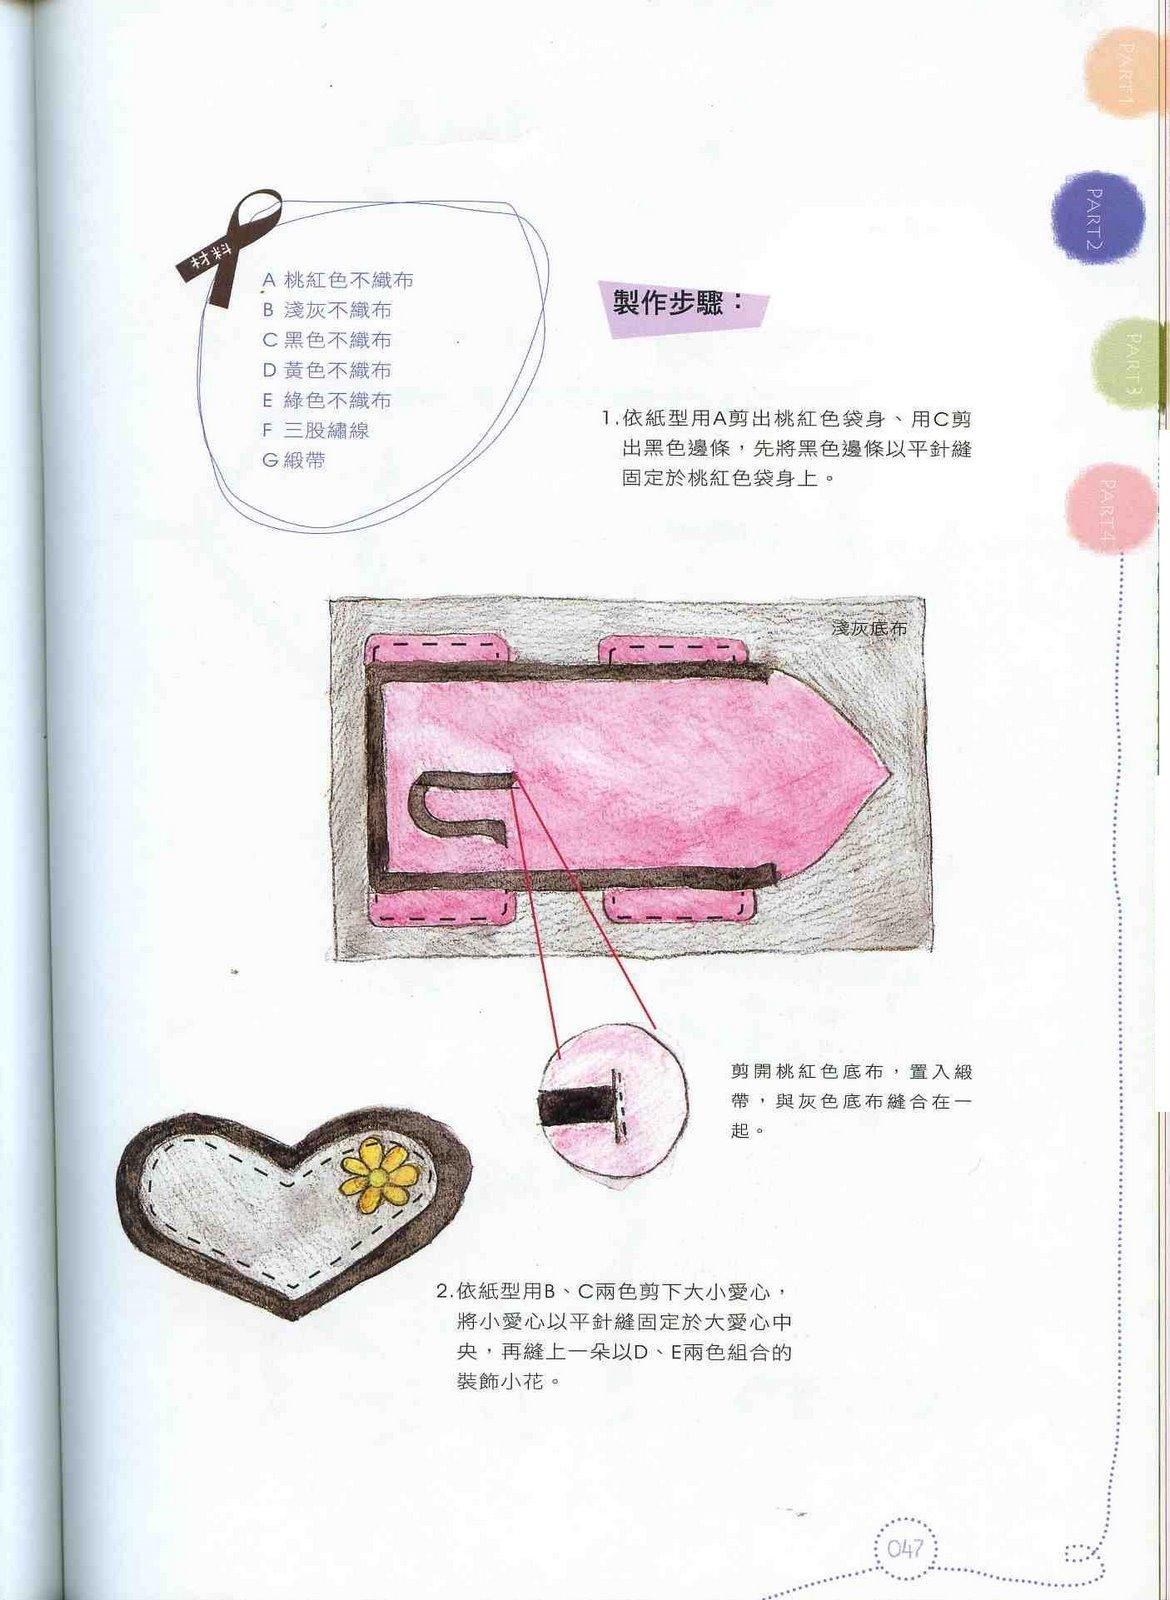 revista de feltro com moldes